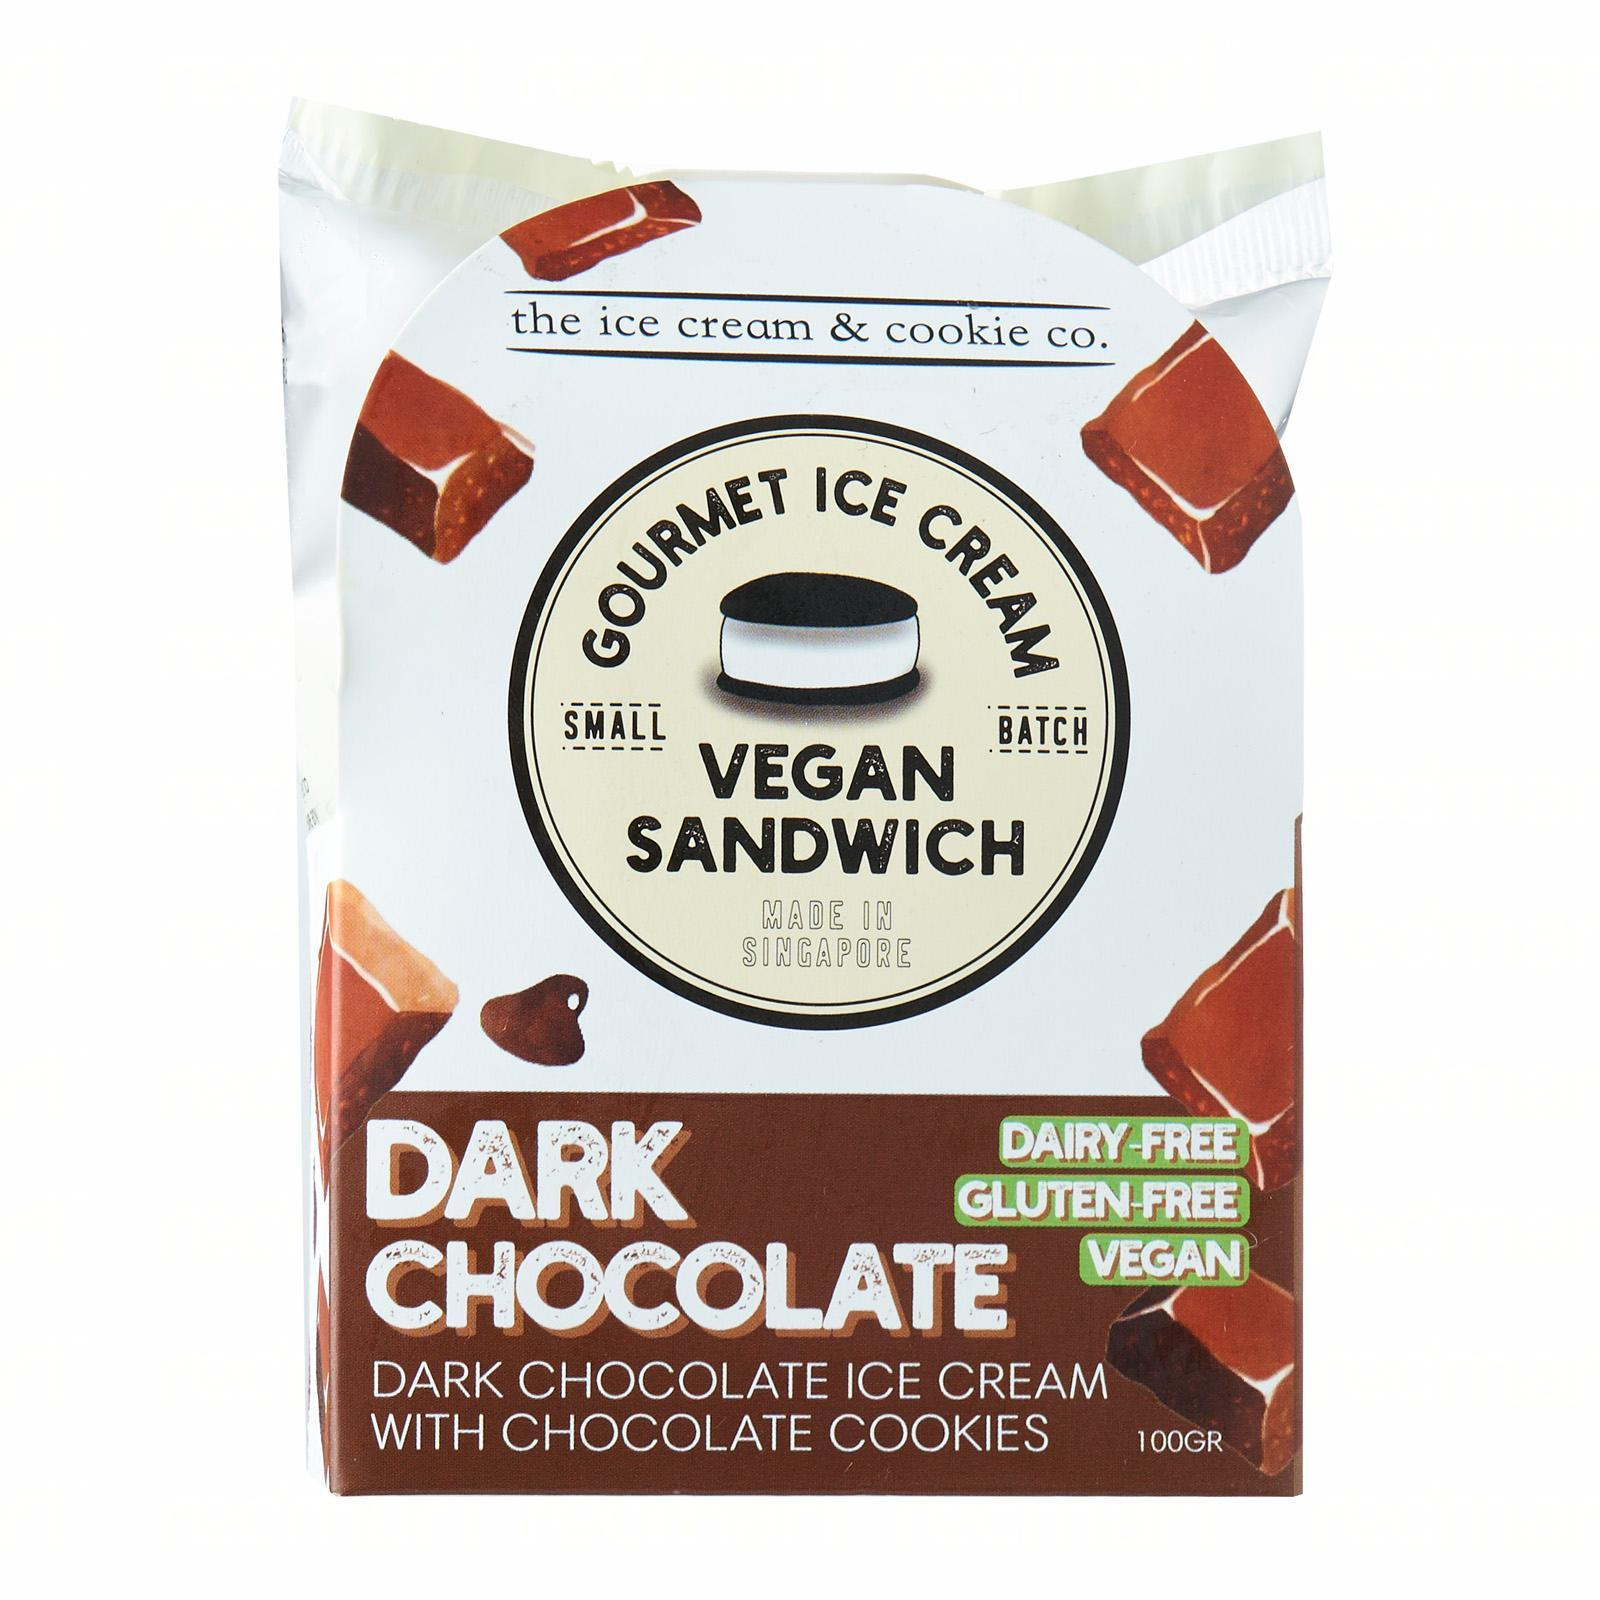 The Ice Cream & Cookie Co. Vegan Dark Chocolate Ice Cream Sandwich (Vegan Dairy-Free and Gluten-Free) Ice Cream